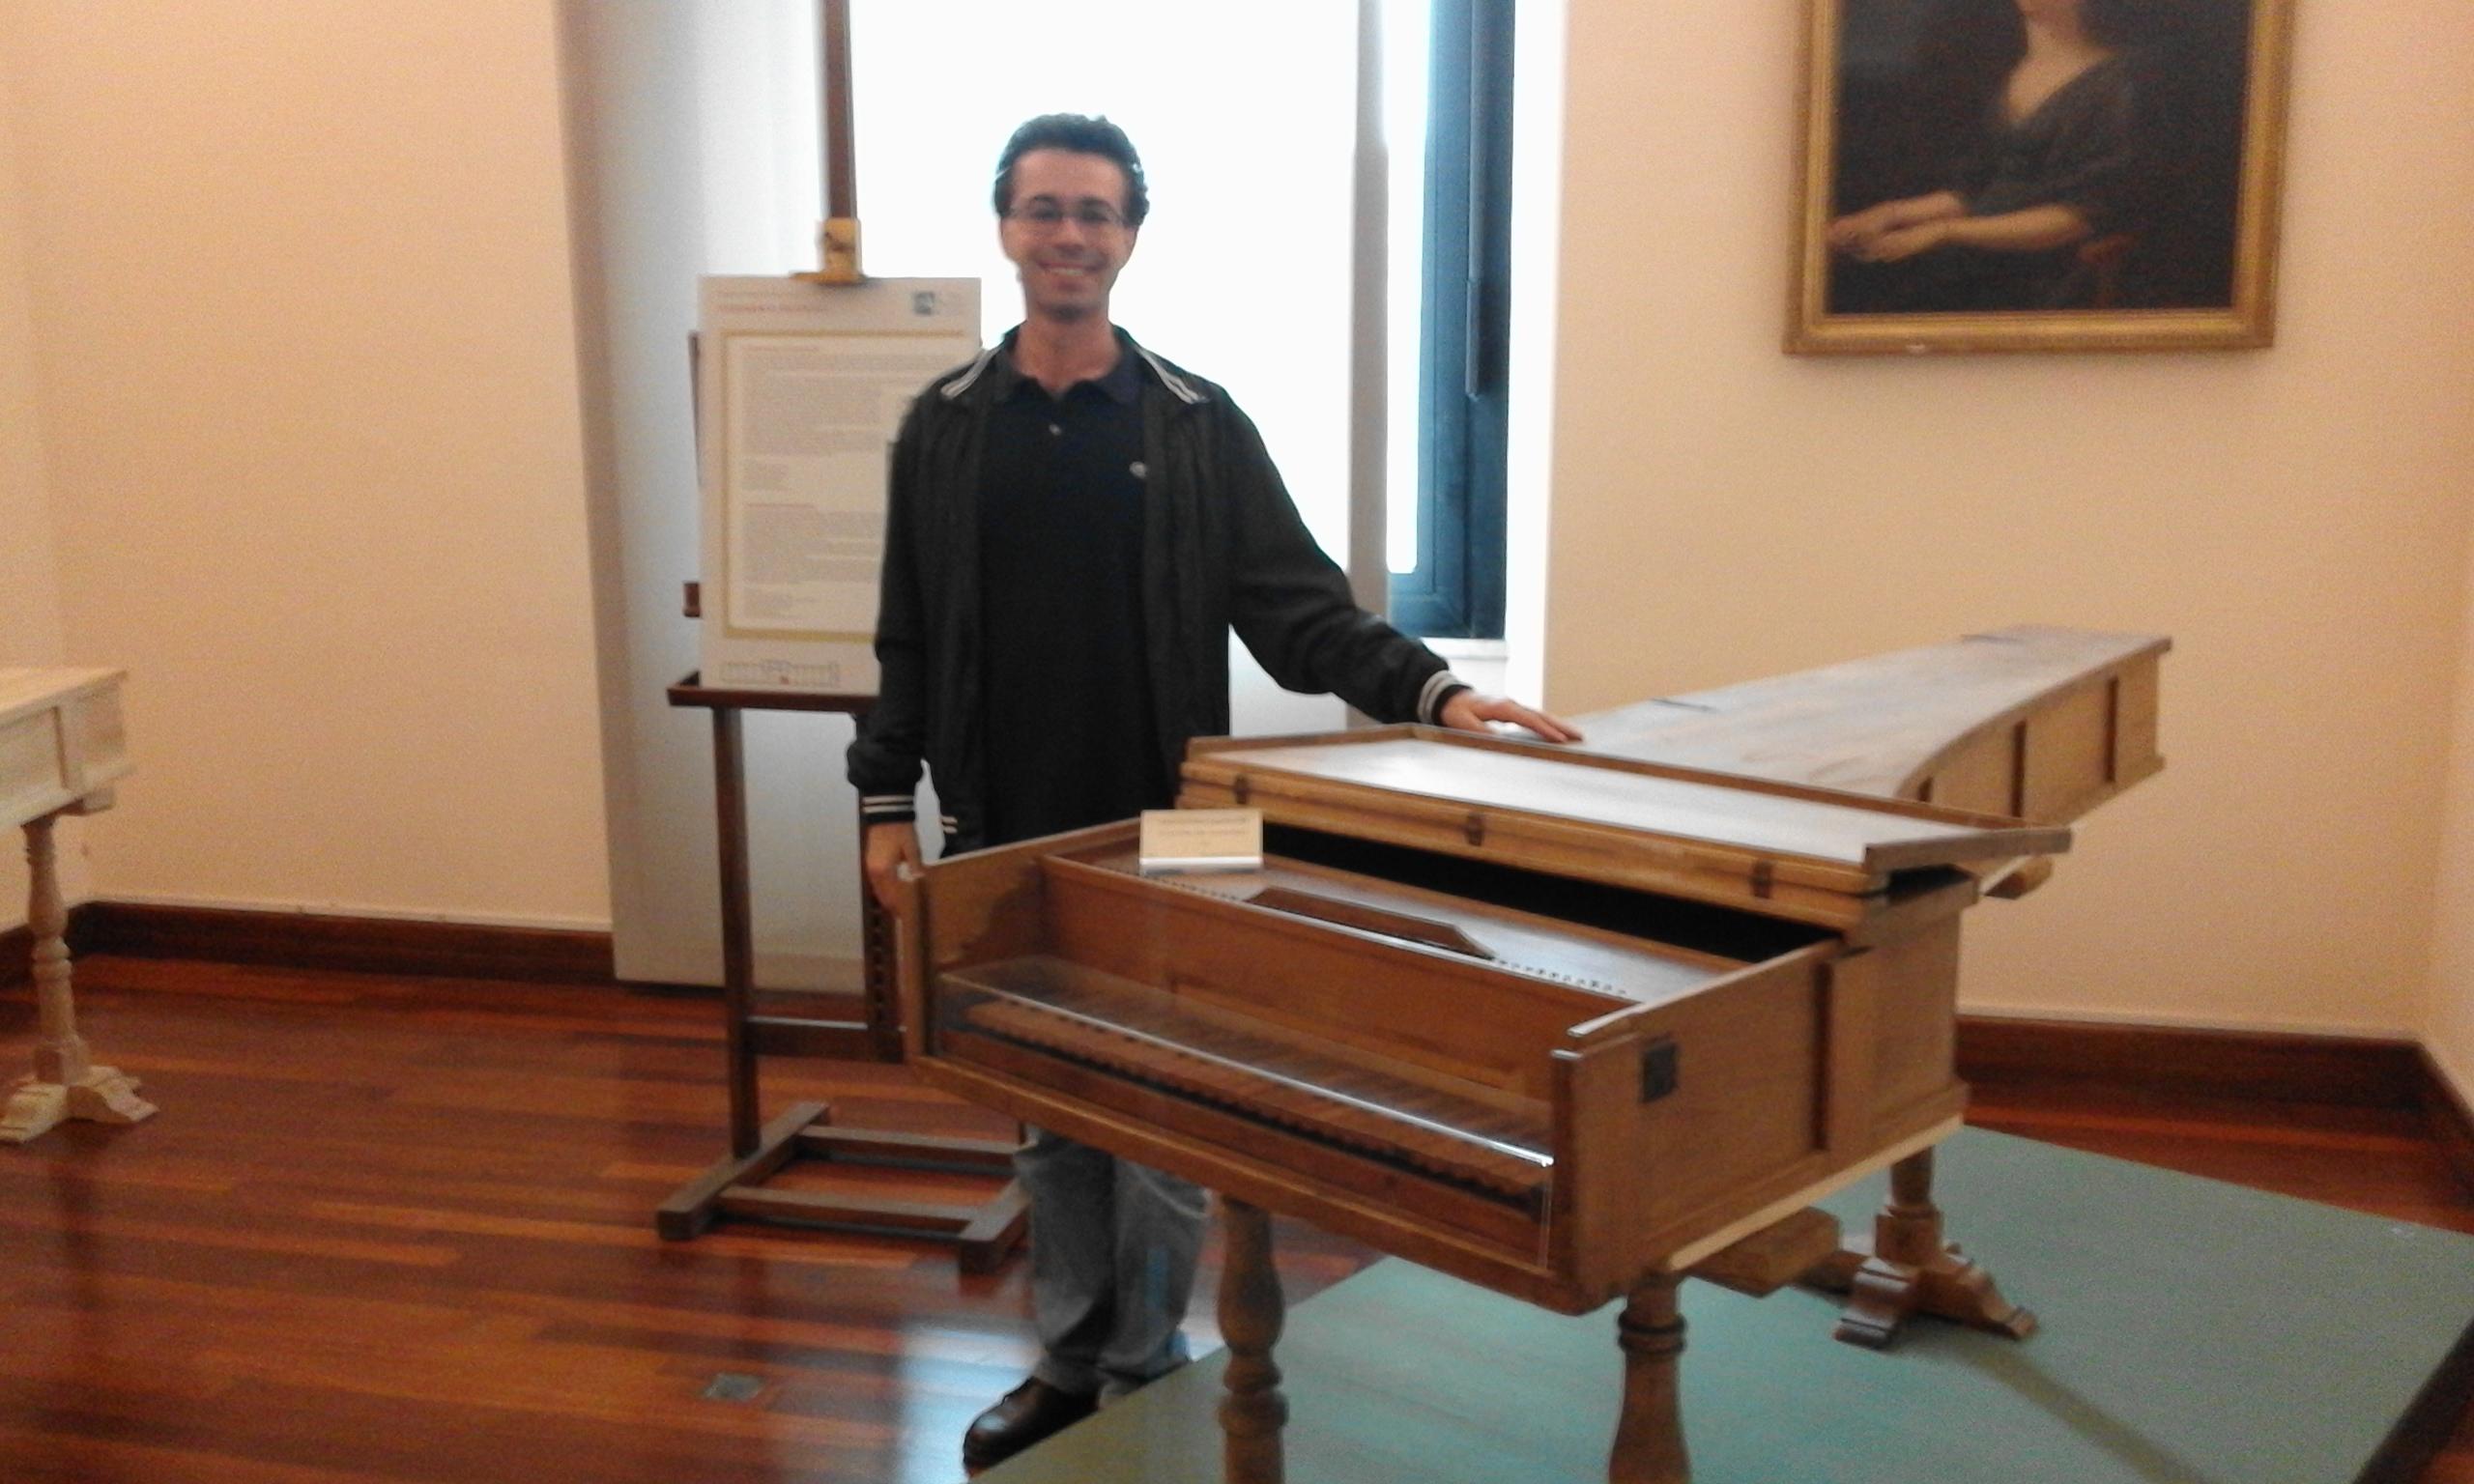 Adel Karanov private guide - Music instrument museum of Rome